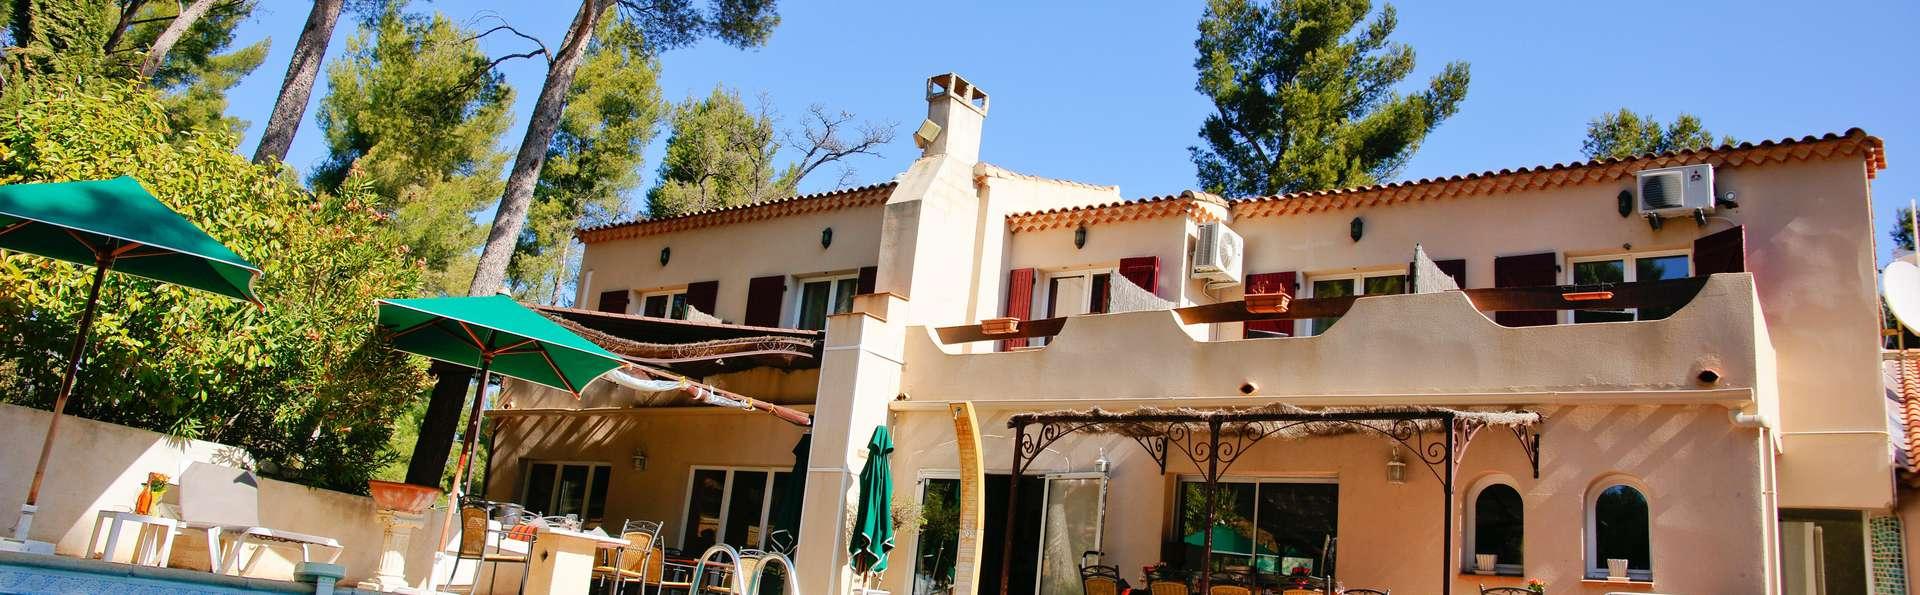 hotel le mas des ecureuils hotel aix en provence. Black Bedroom Furniture Sets. Home Design Ideas